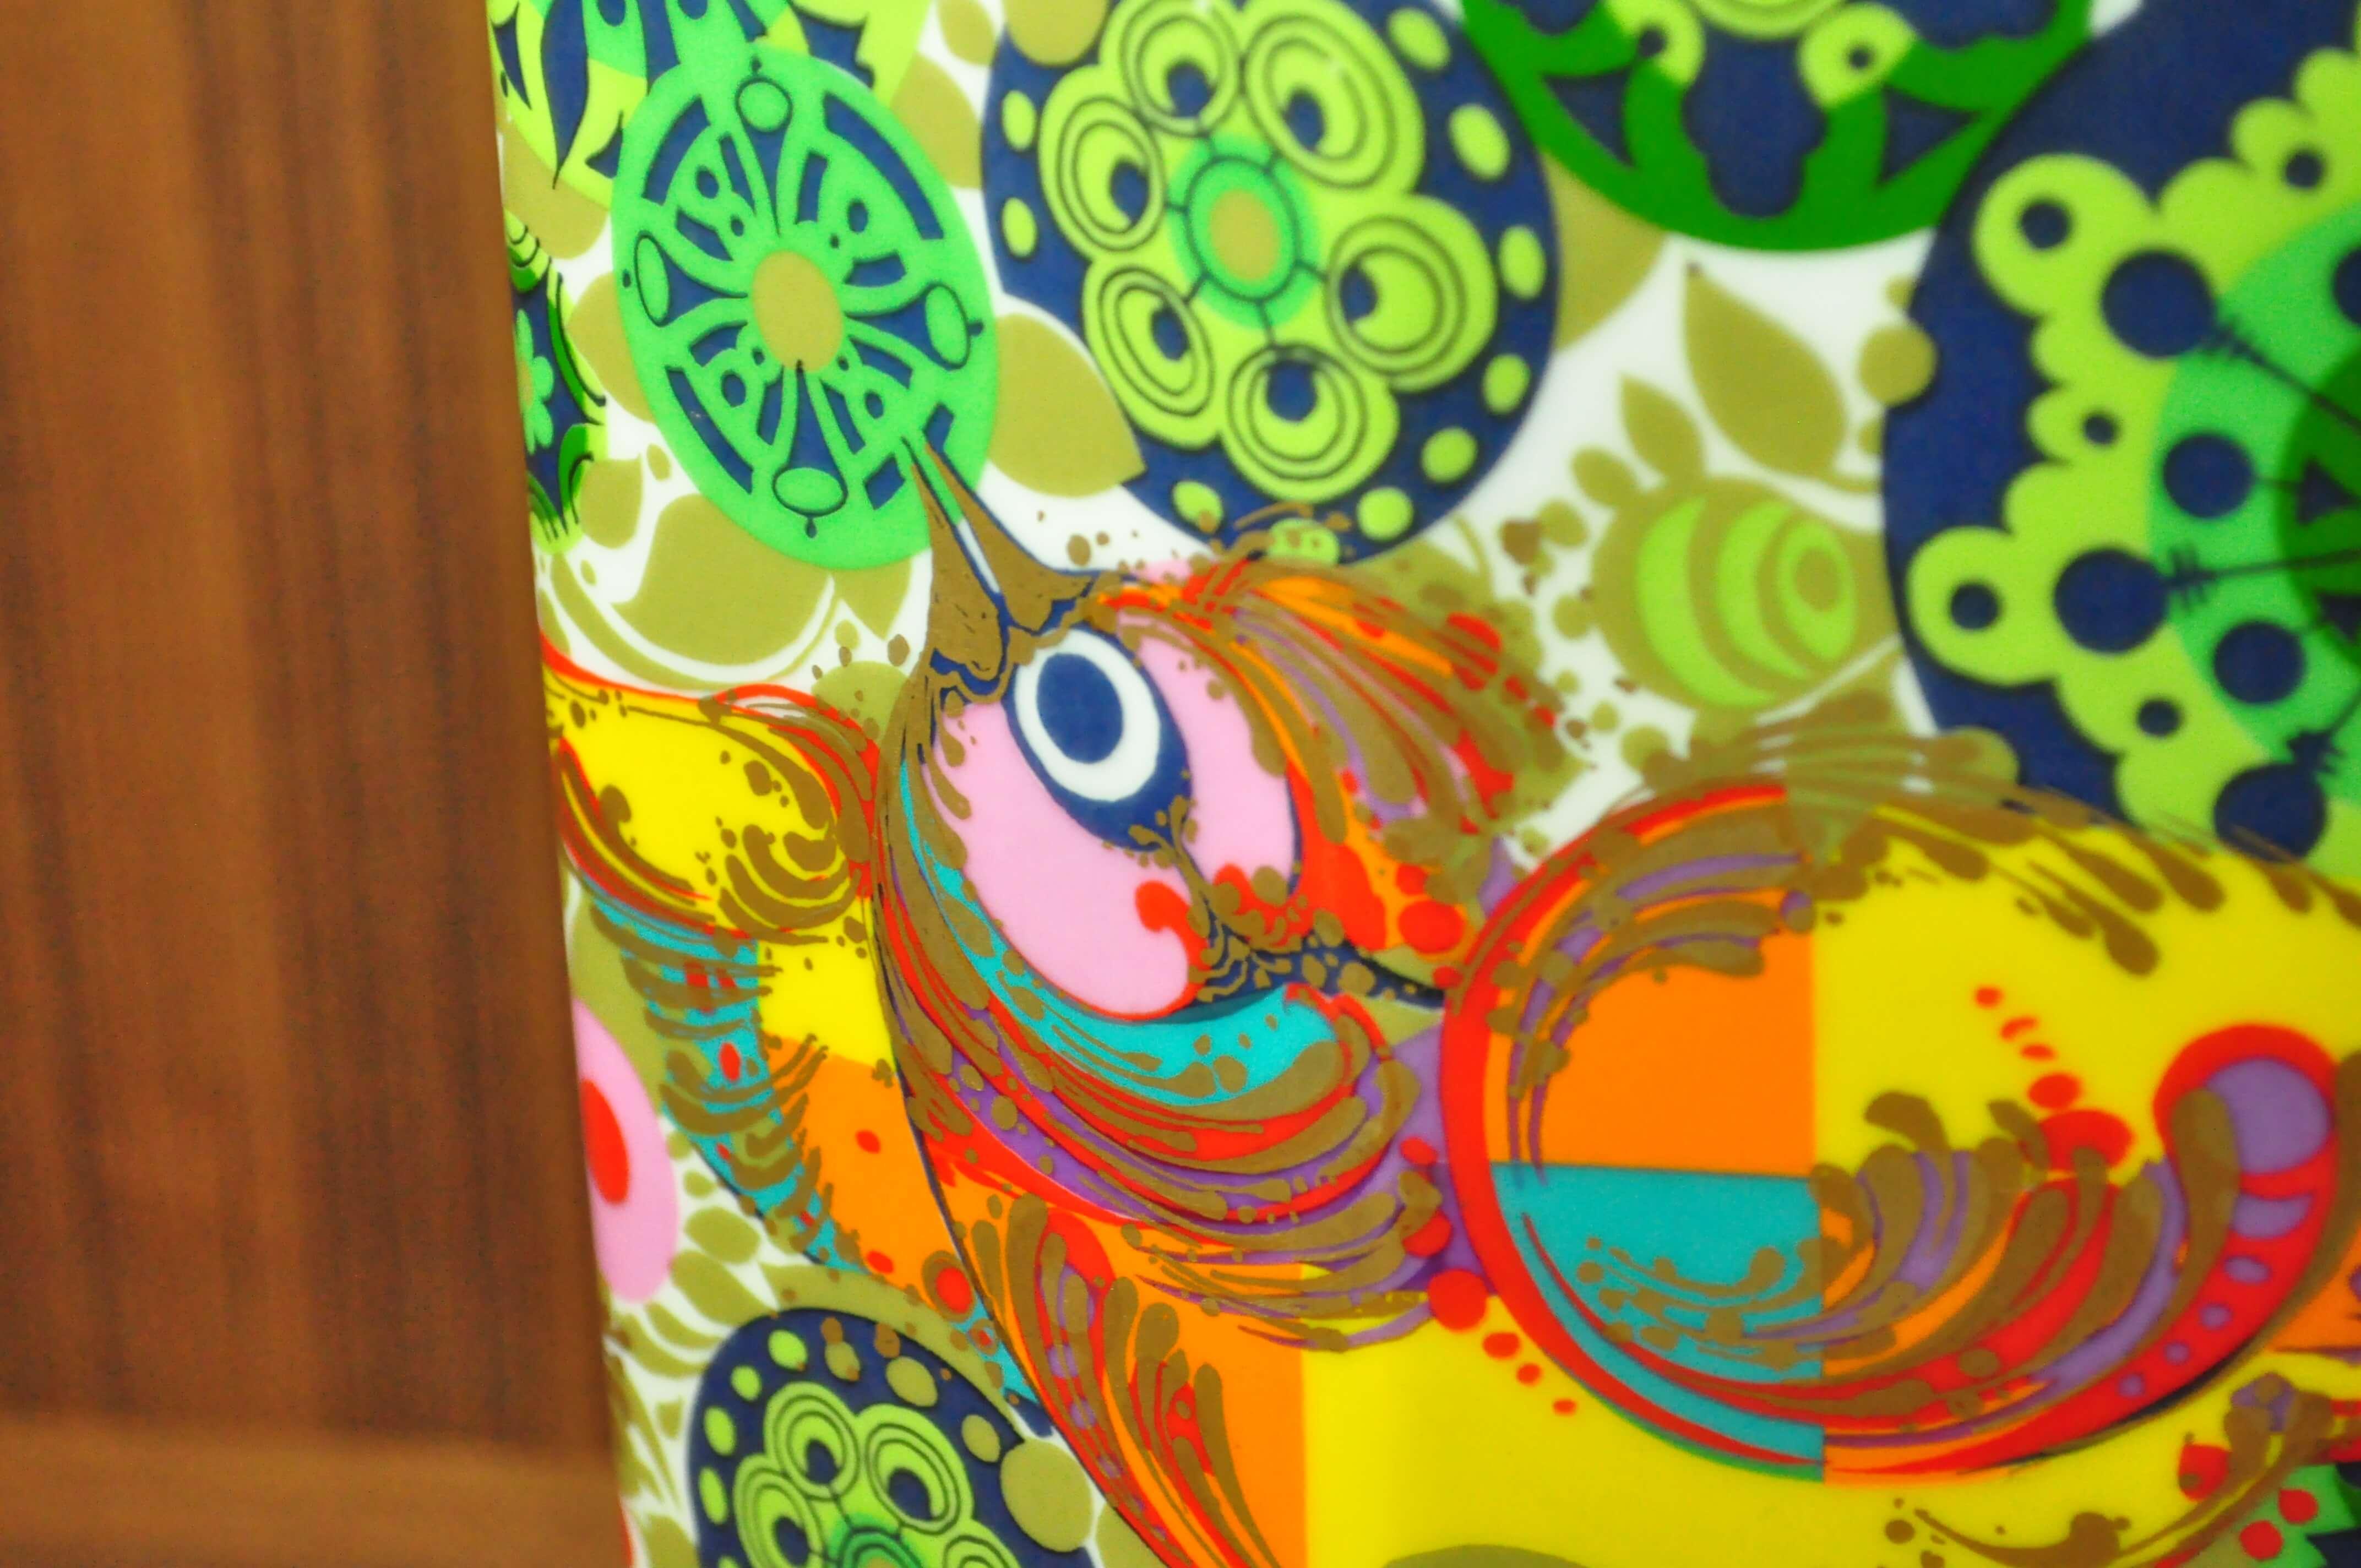 Rosenthal studio-linie Flower Vase/ローゼンタール スタジオライン フラワーベース